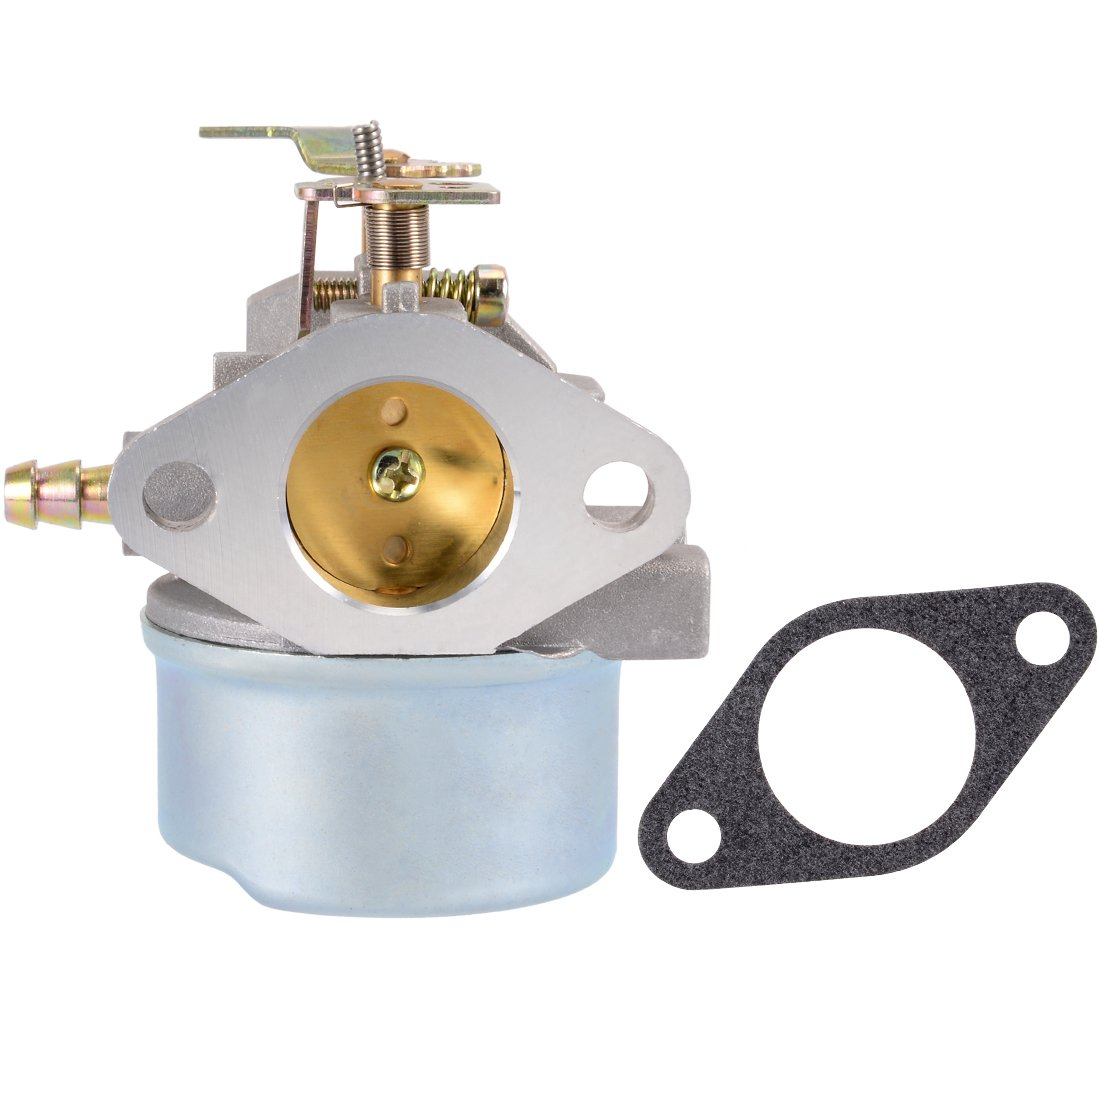 Carburetor Carb W//Gasket For TECUMSEH 640349 640052 640054 8hp 9hp 10hp